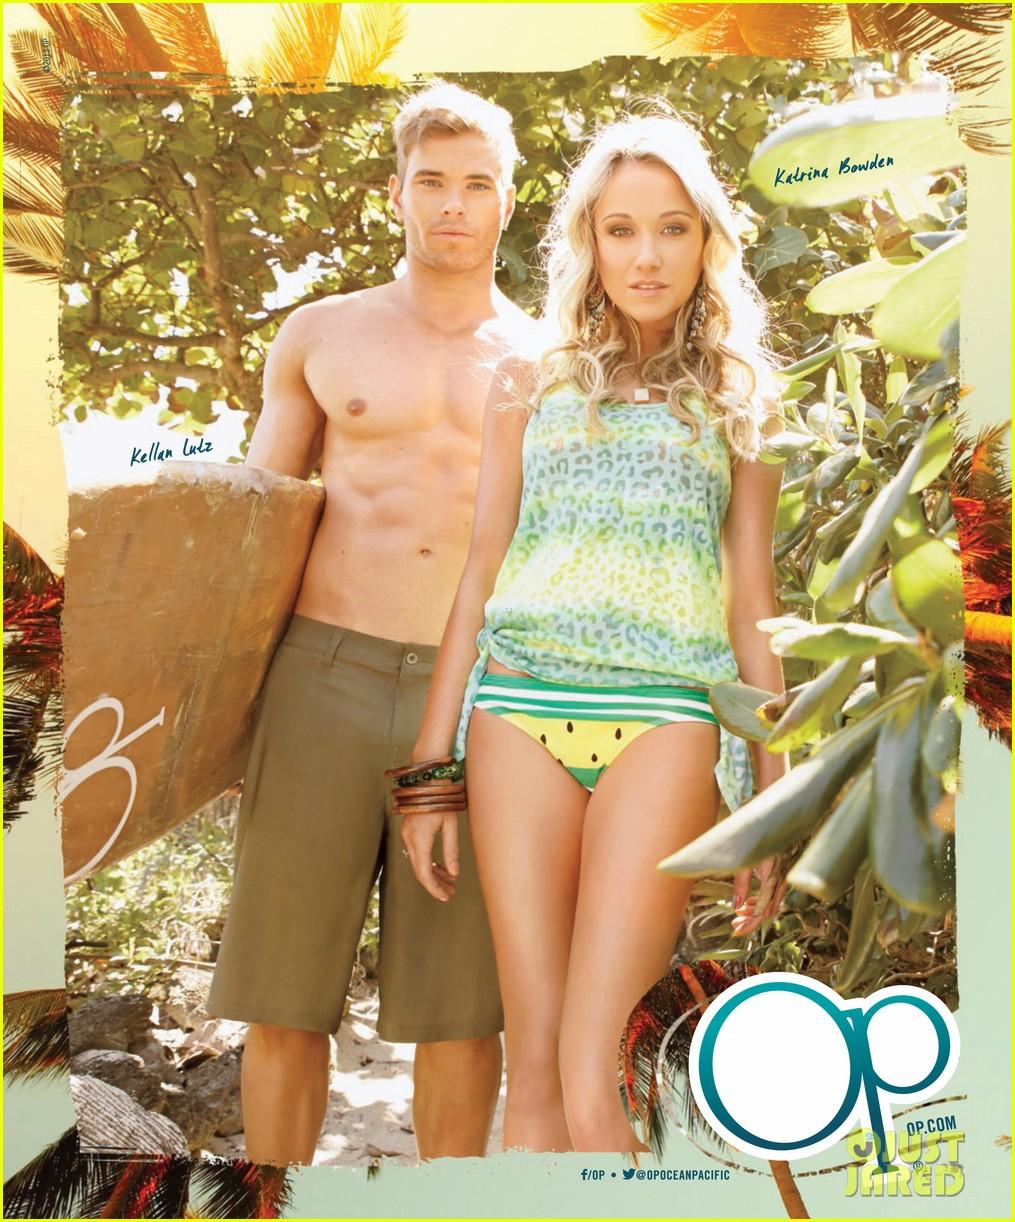 kellan lutz shirtless op campaign with bikini katrina bowden 052846879